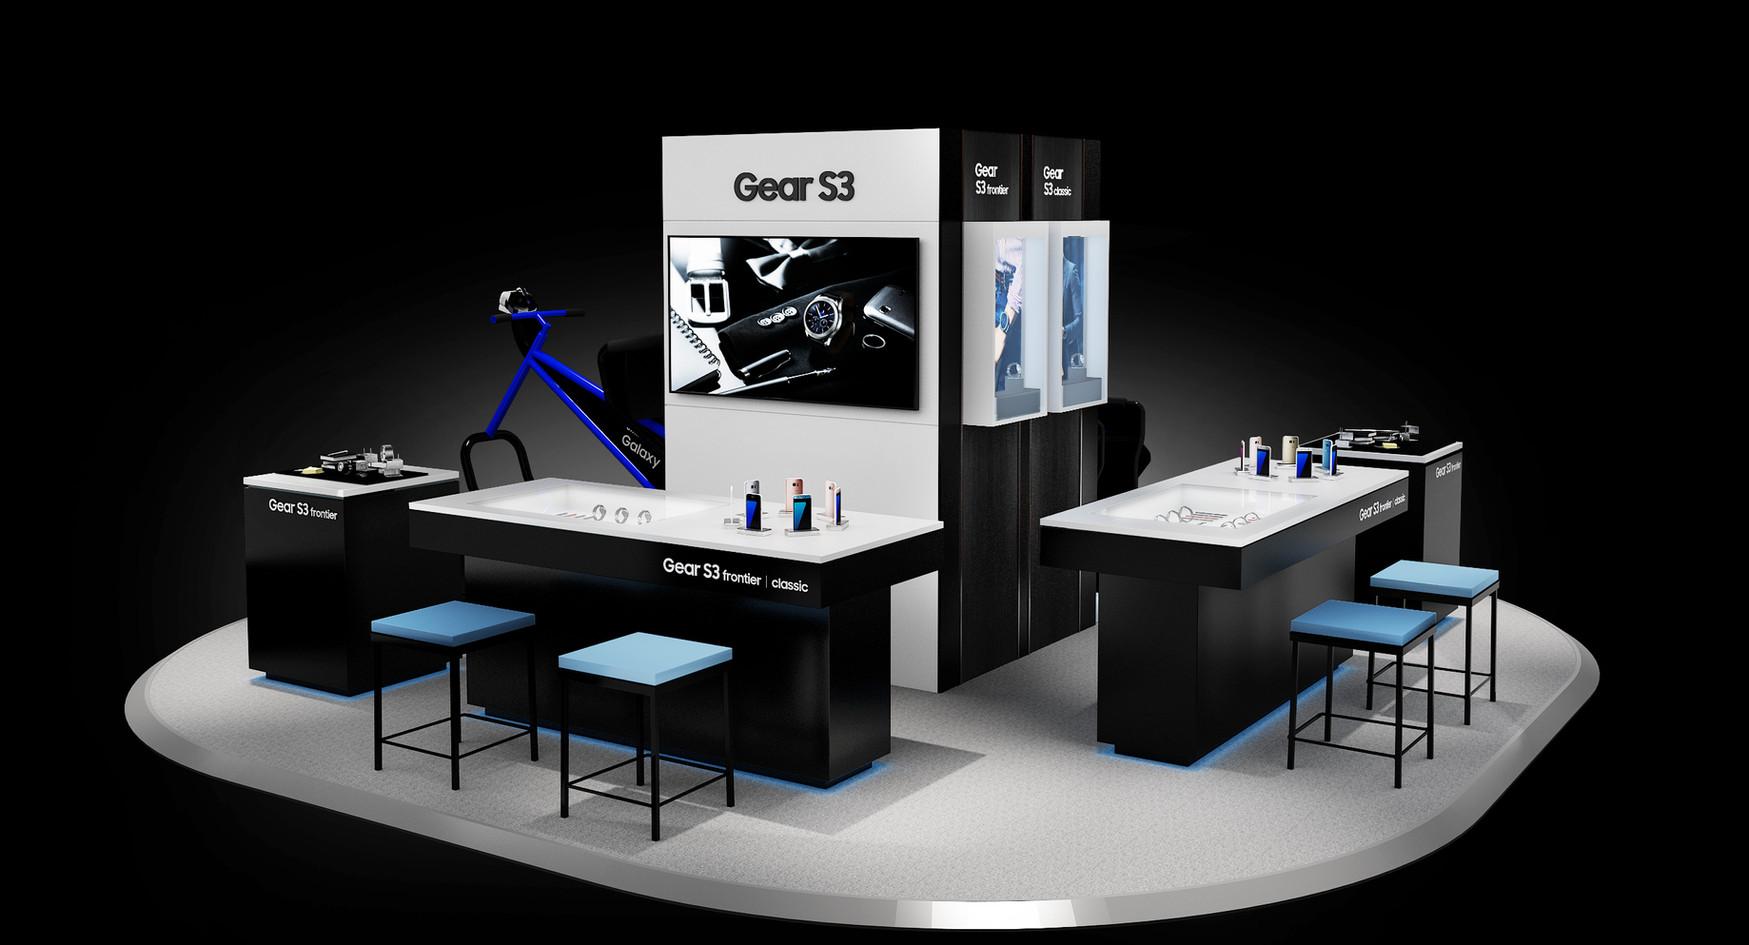 Galaxy S7 & Gear S3 Studio